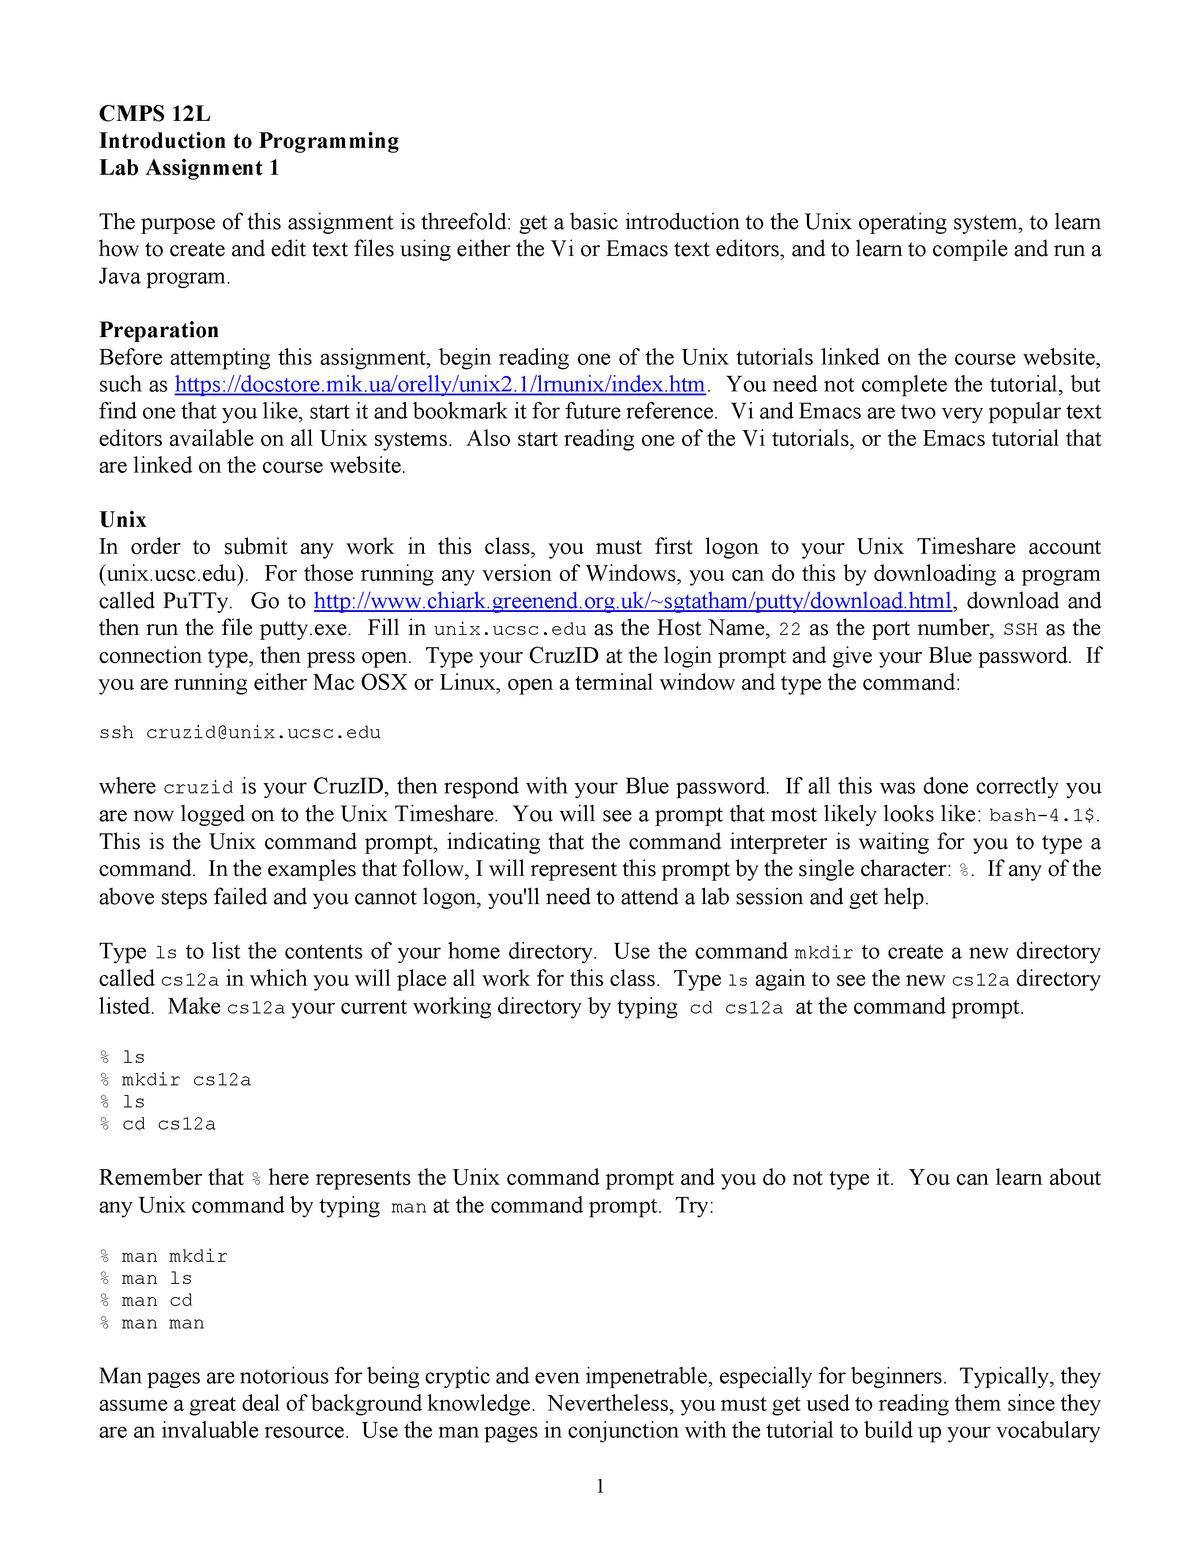 Learn Emacs